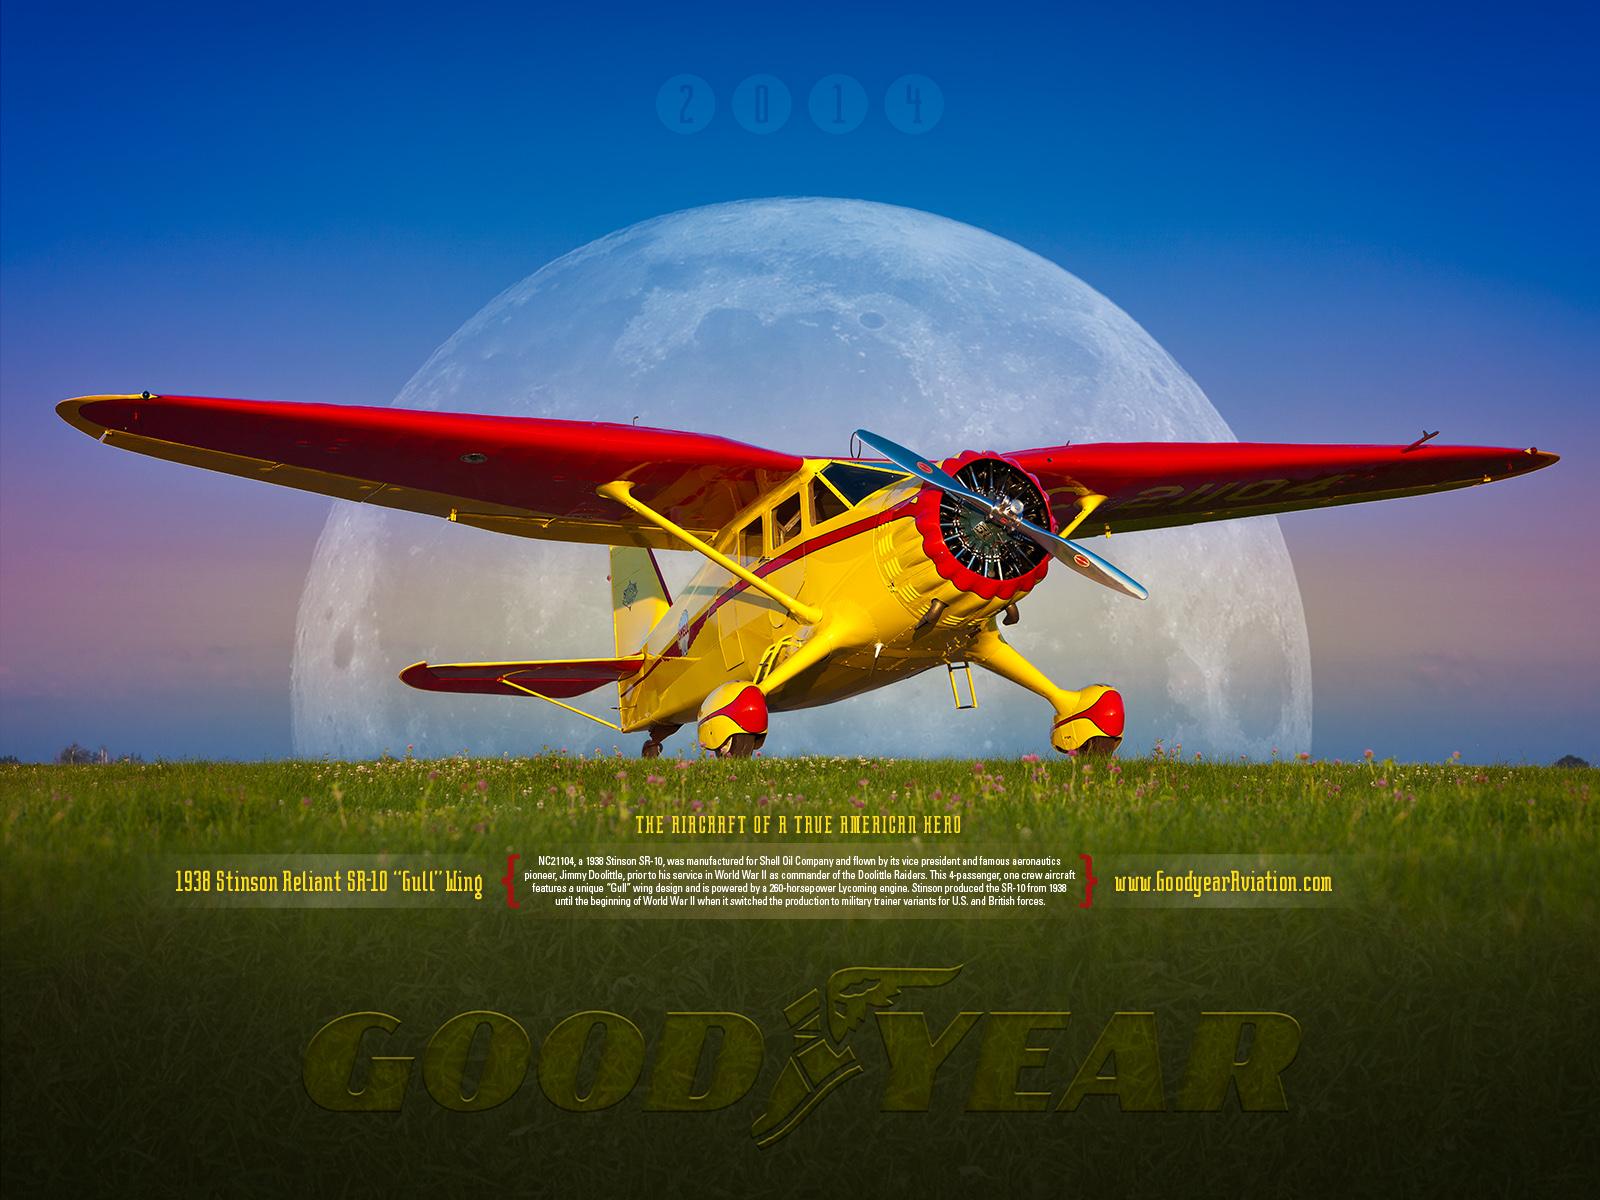 Goodyear Aviation Desktop Wallpaper Goodyear Aviation Tires